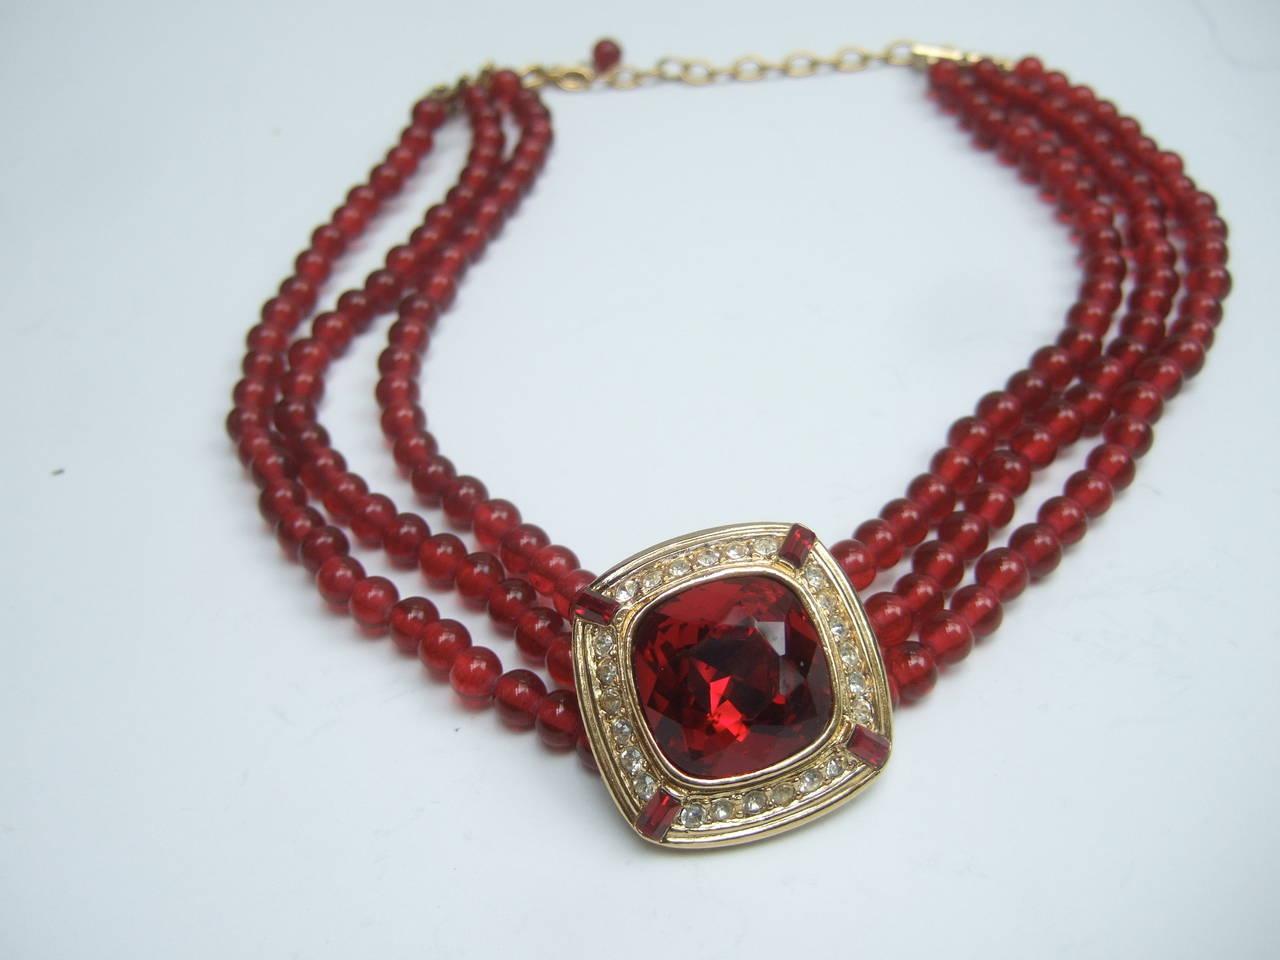 Trifari Elegant Ruby Glass Beaded Choker Necklace c 1980 8